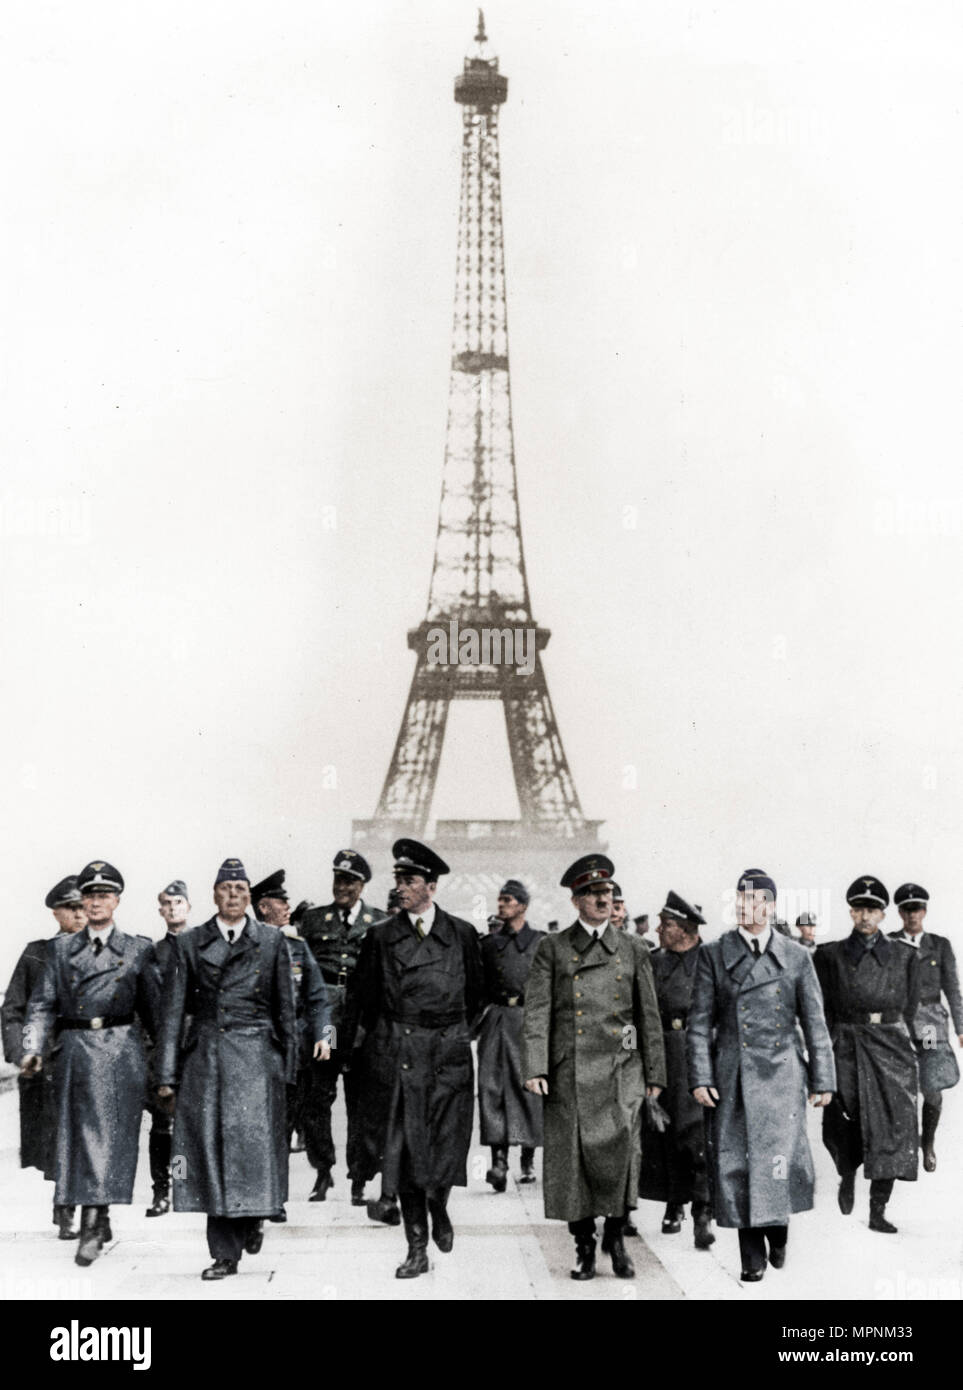 Adolf Hitler, German Nazi dictator, inspecting occupied Paris, France, 1940.  Artist: Unknown. - Stock Image